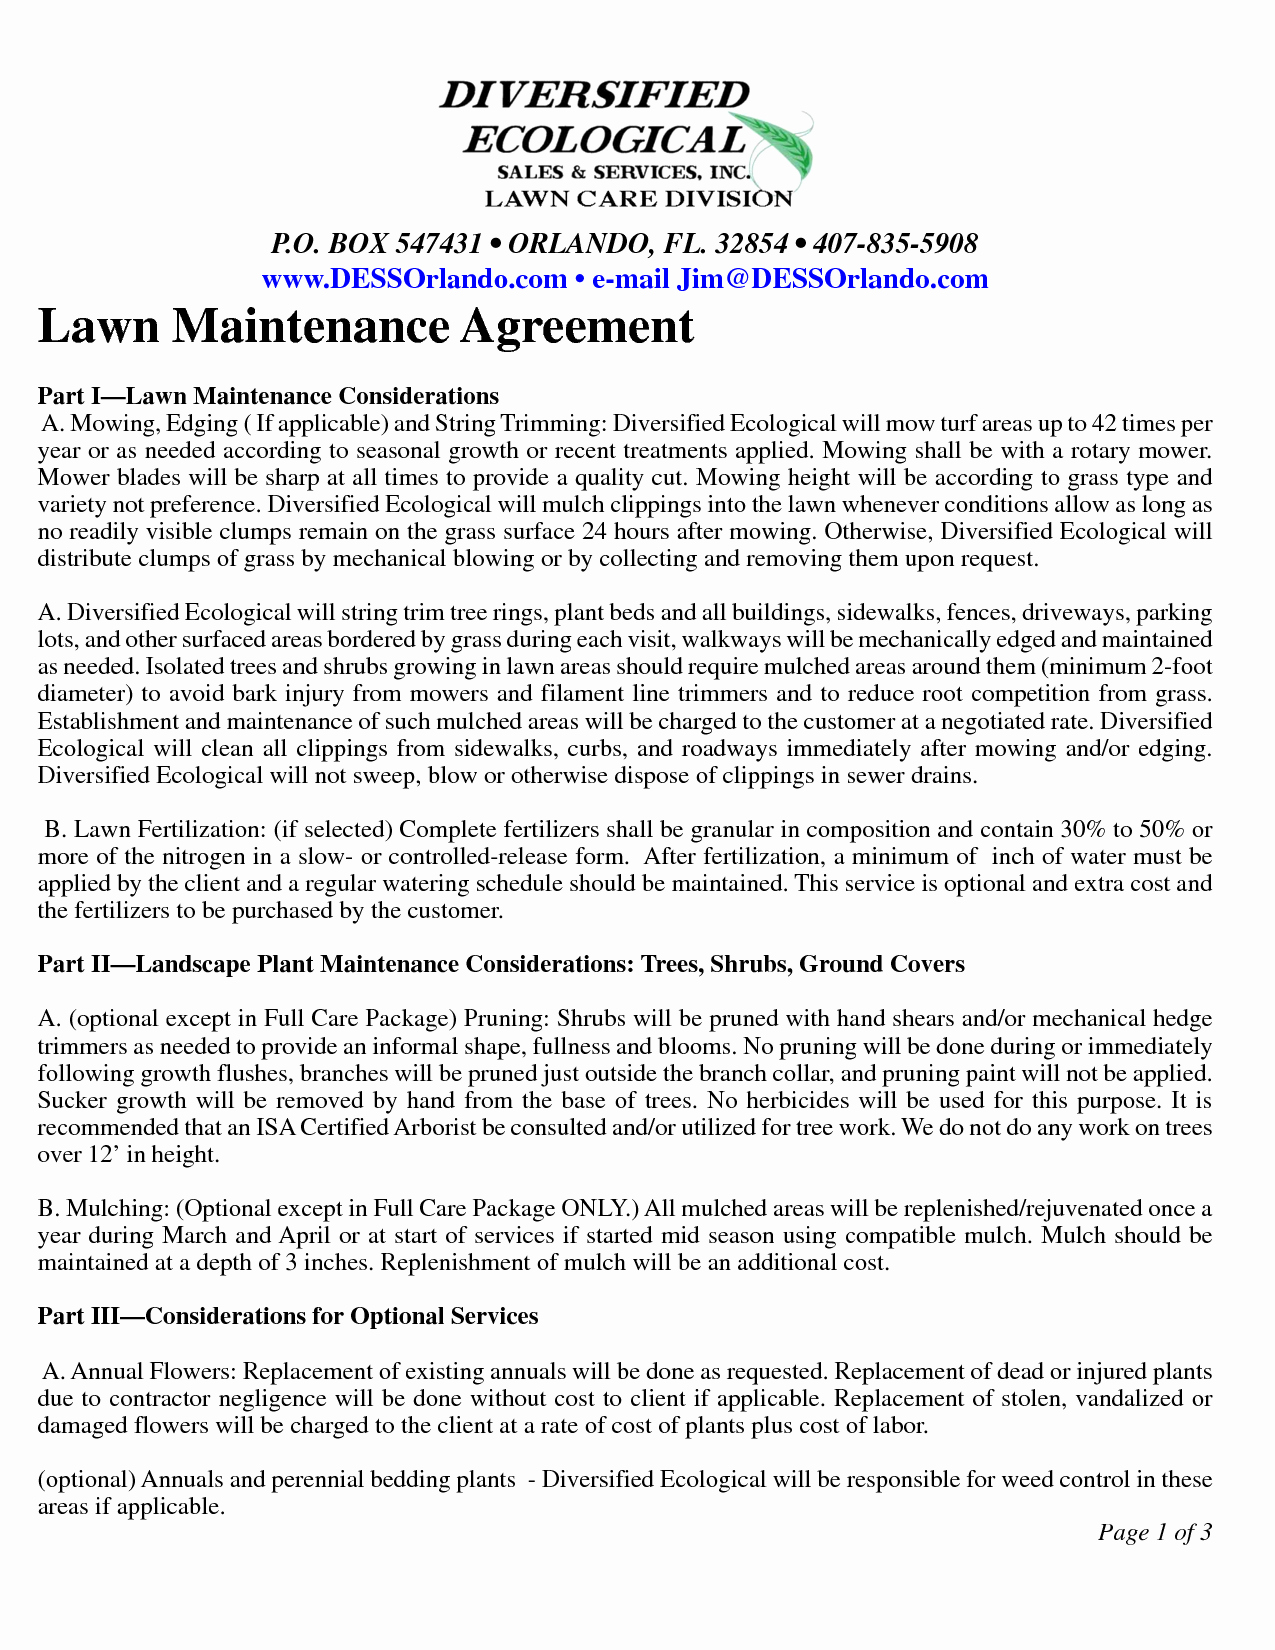 Landscape Maintenance Contract Template Luxury Lawn Maintenance Contract Agreement Free Printable Documents